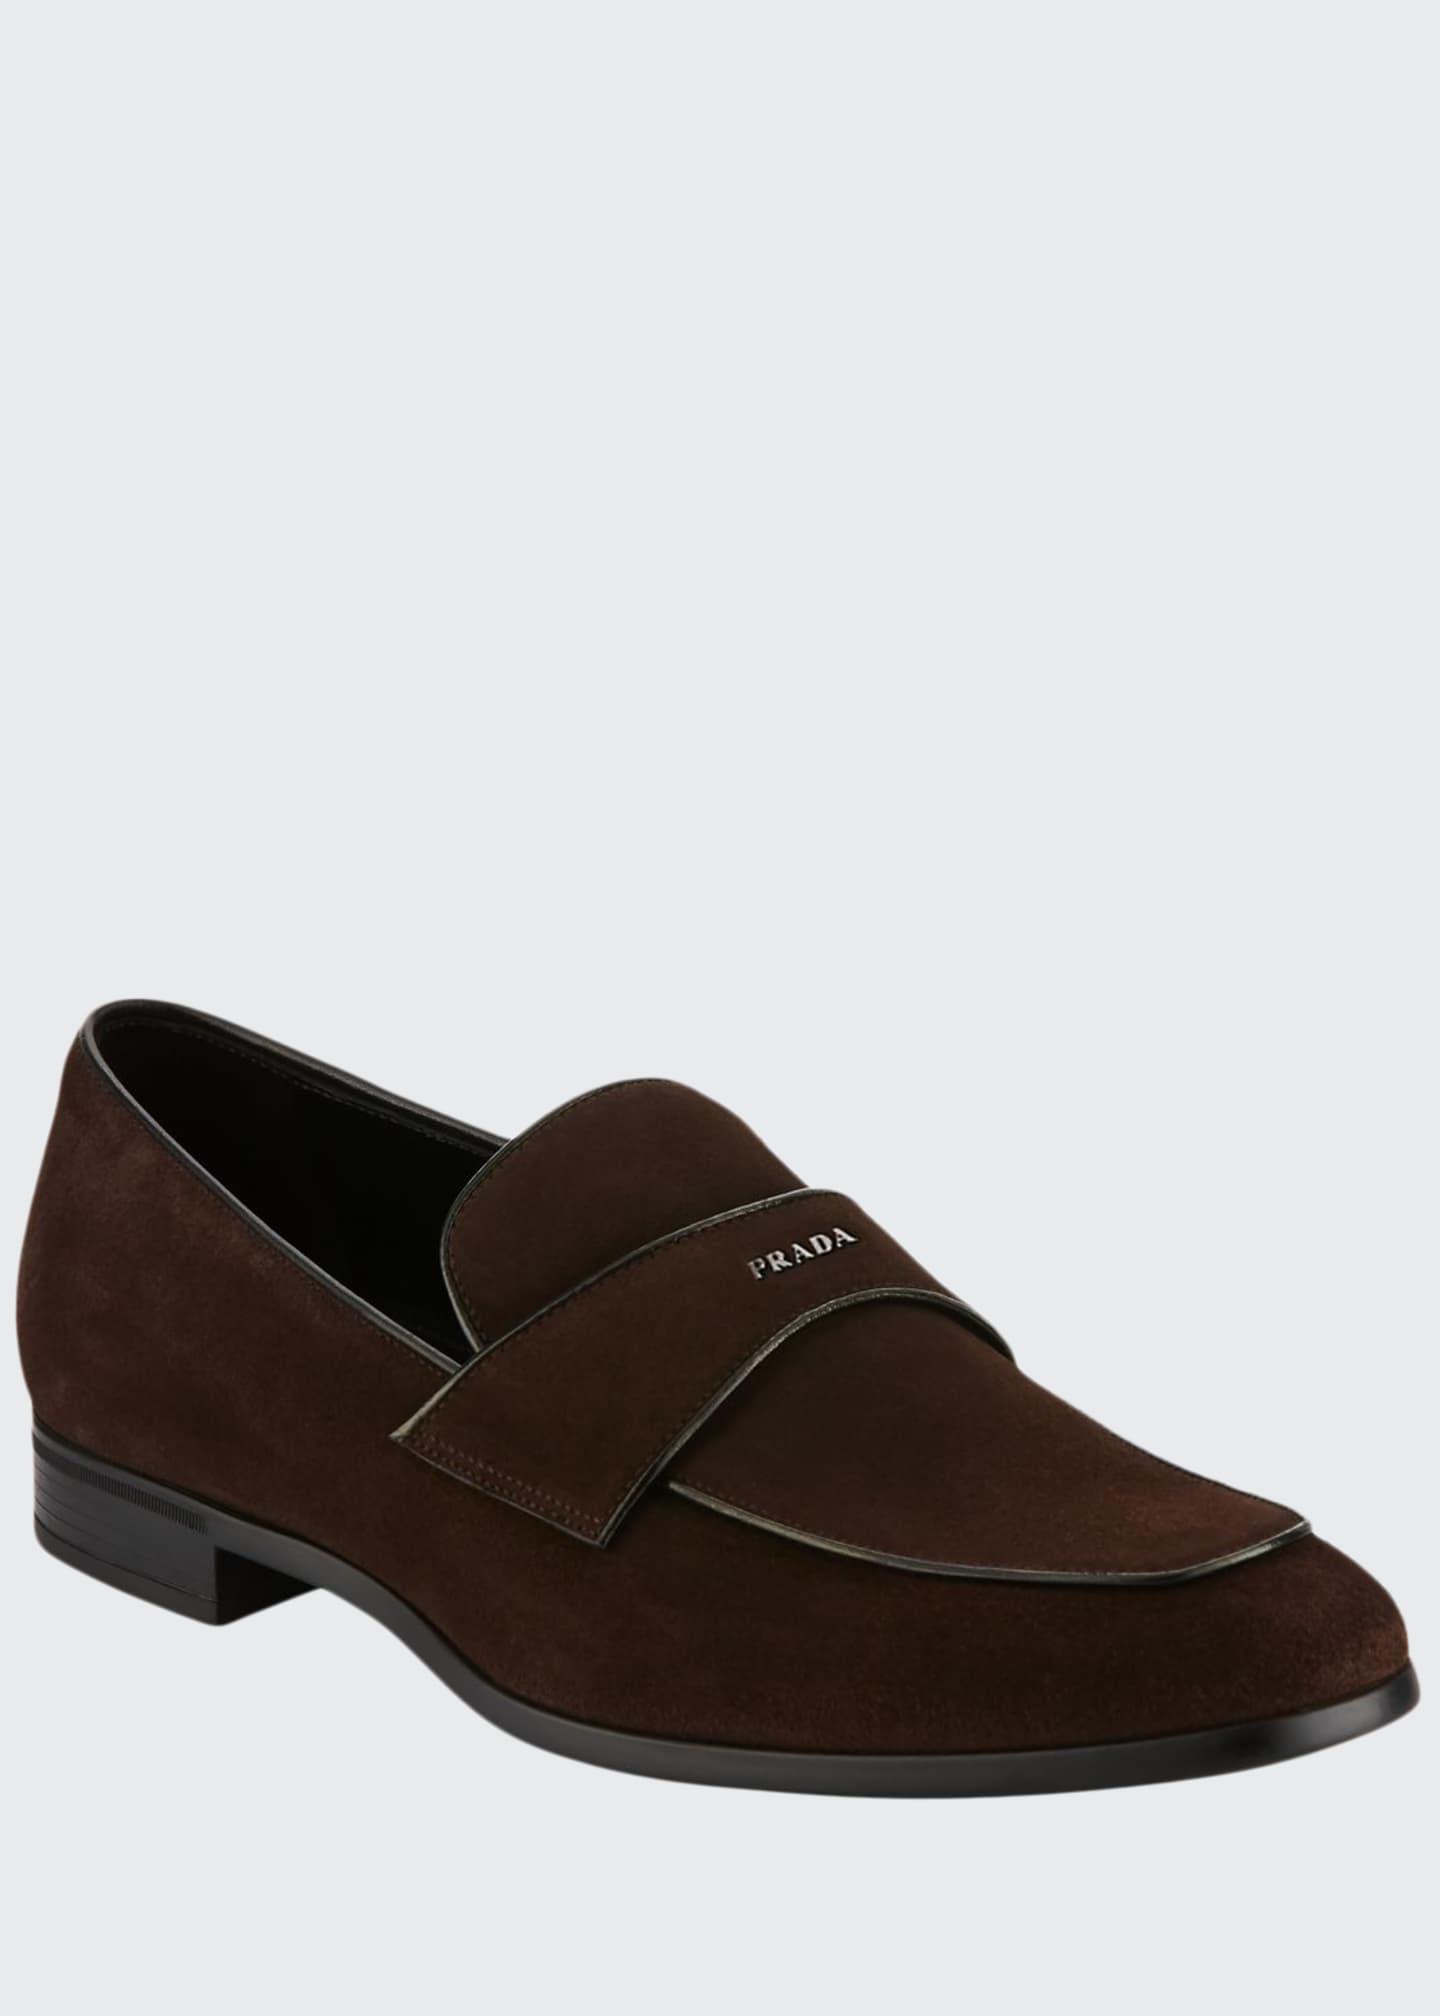 Prada Suede Vitello Loafer